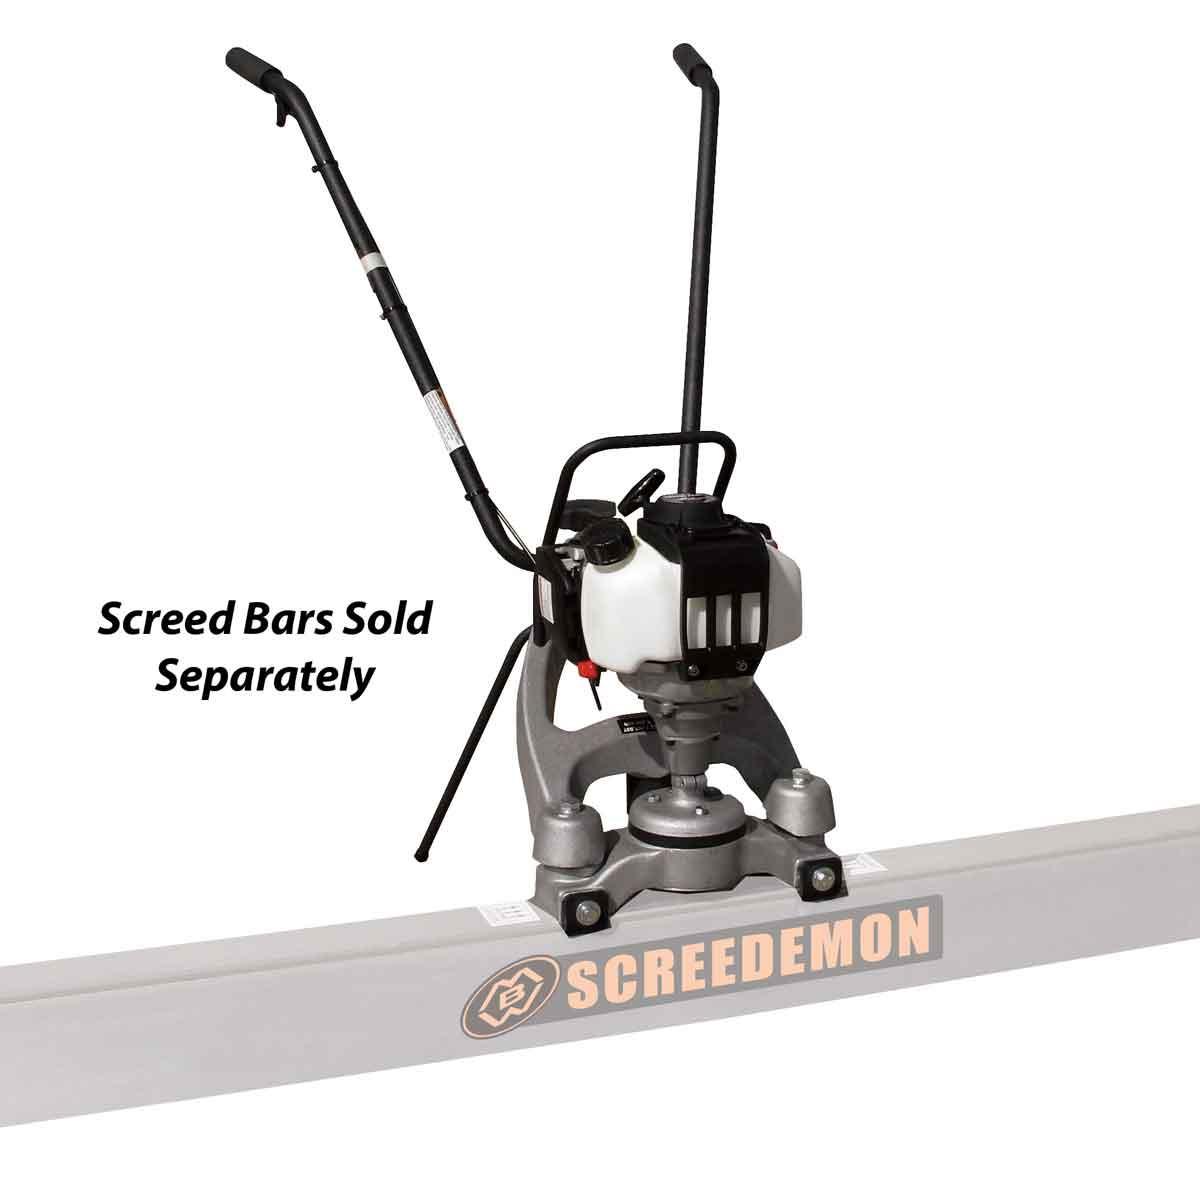 WS500H MBW ScreeDemon Power Unit